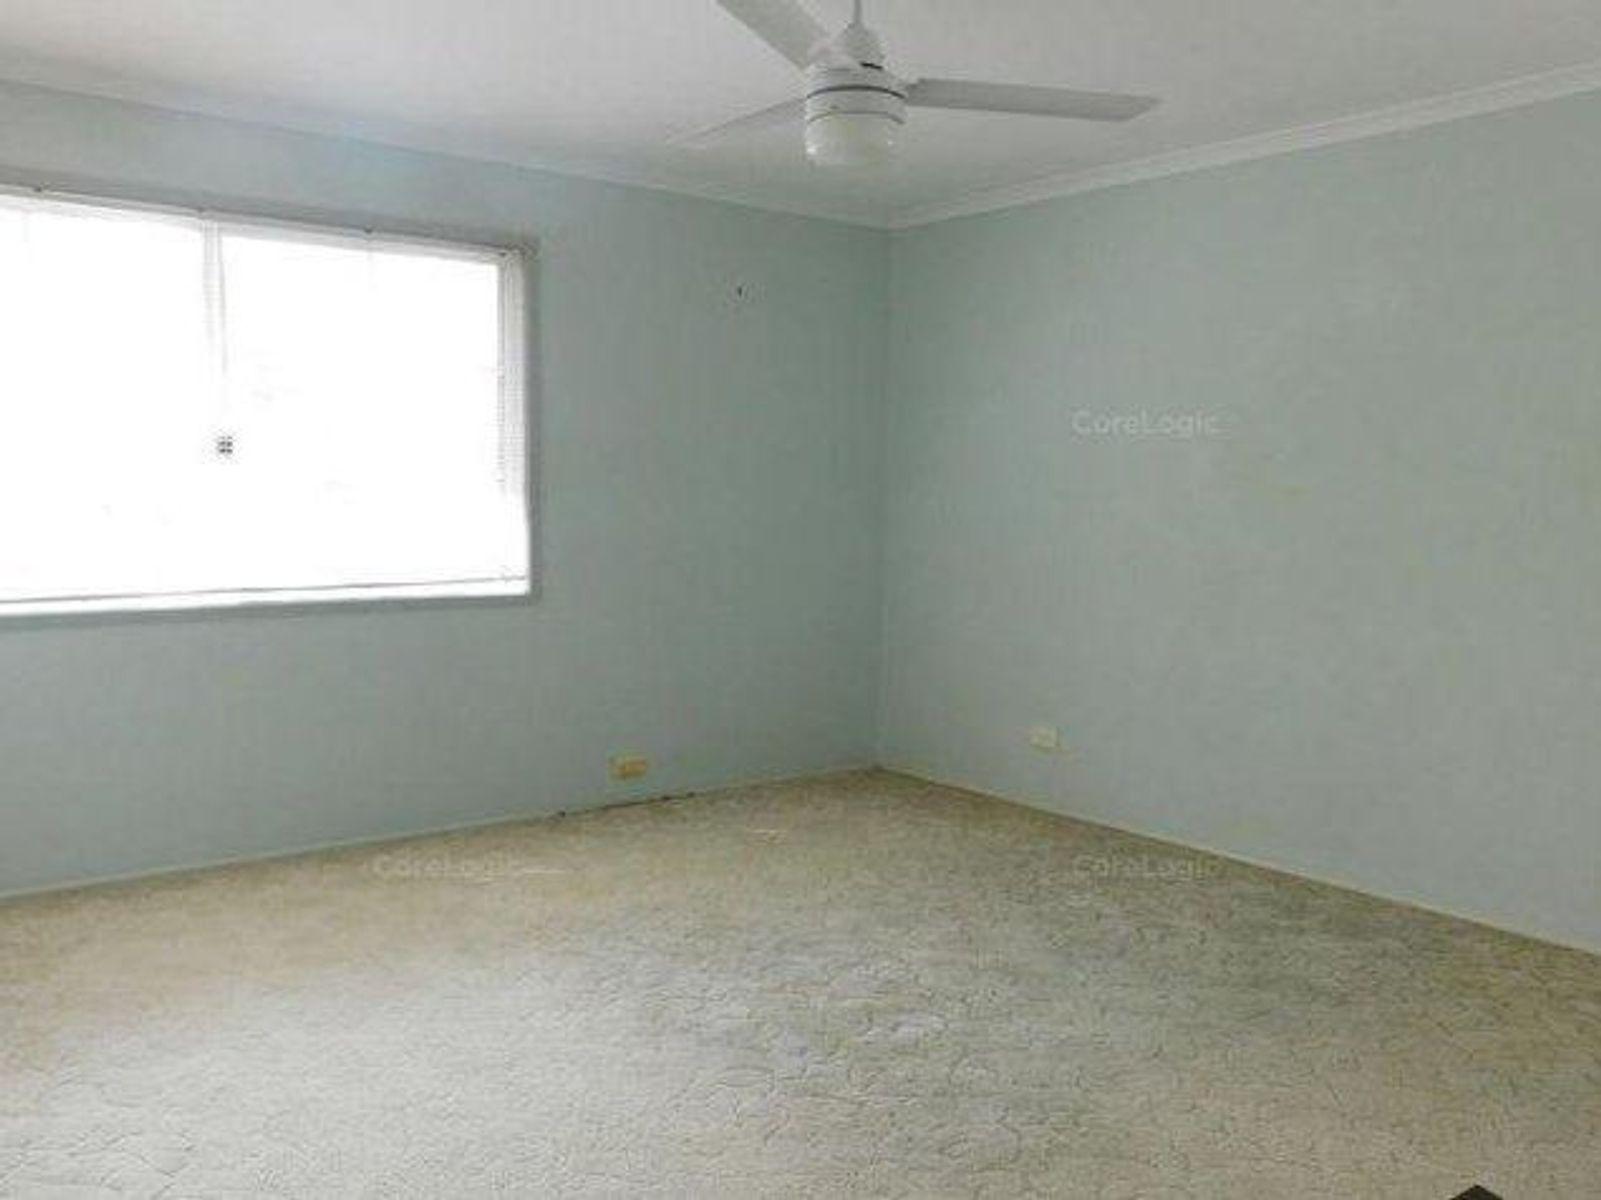 32/52 Frank Street, Thorneside, QLD 4158